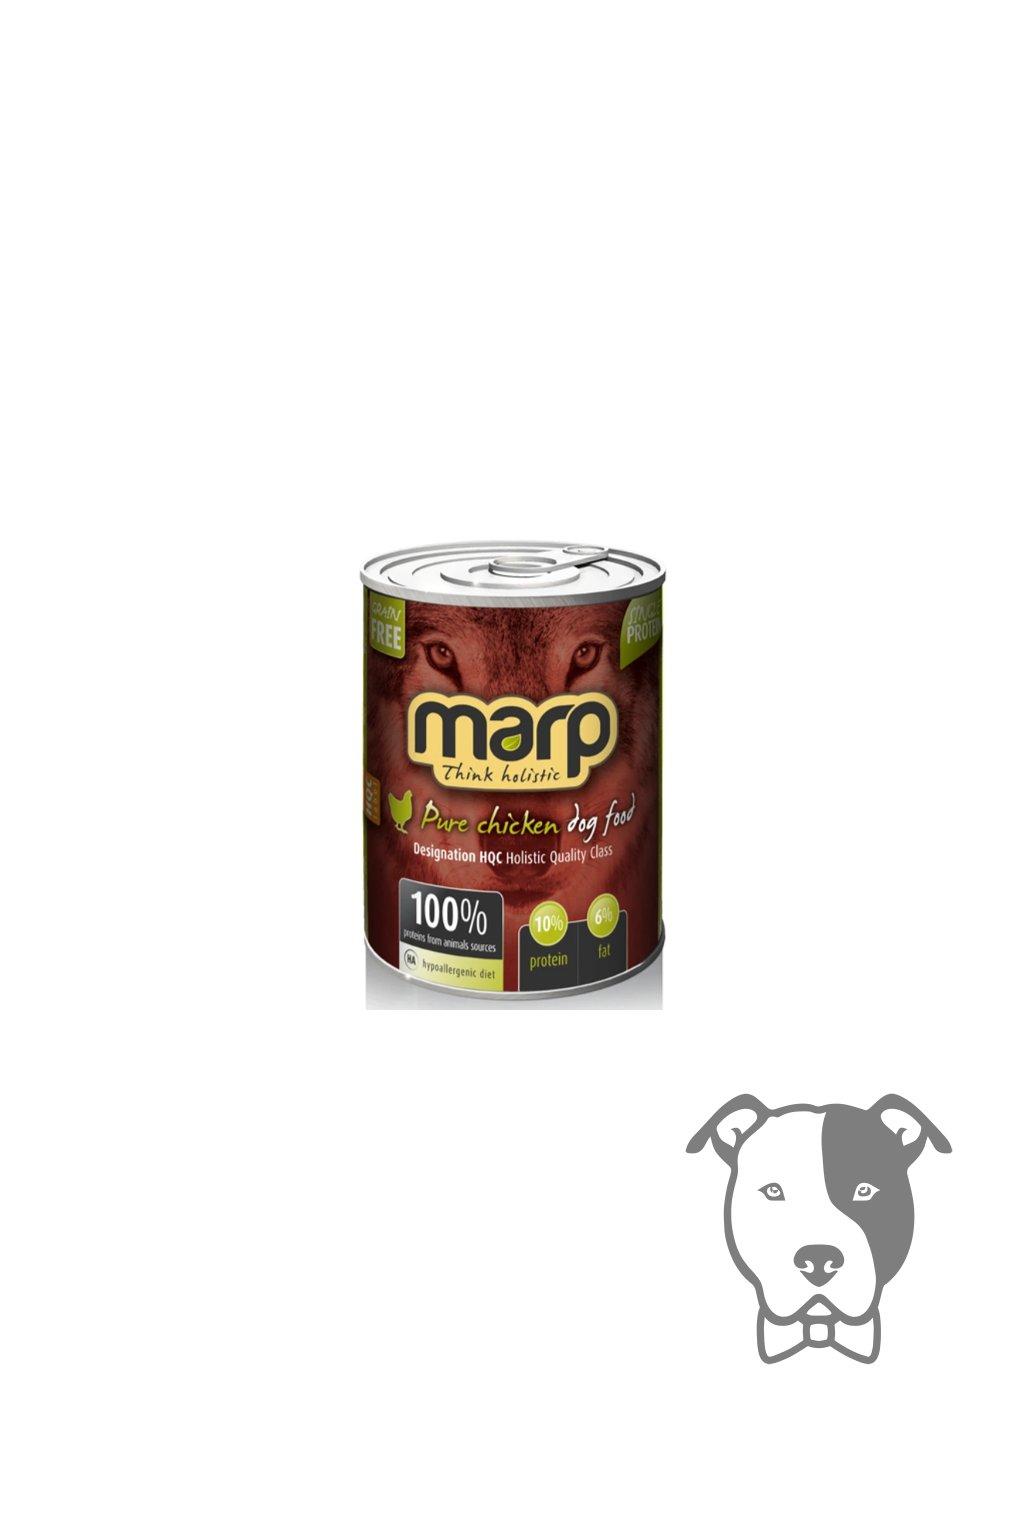 marpp1